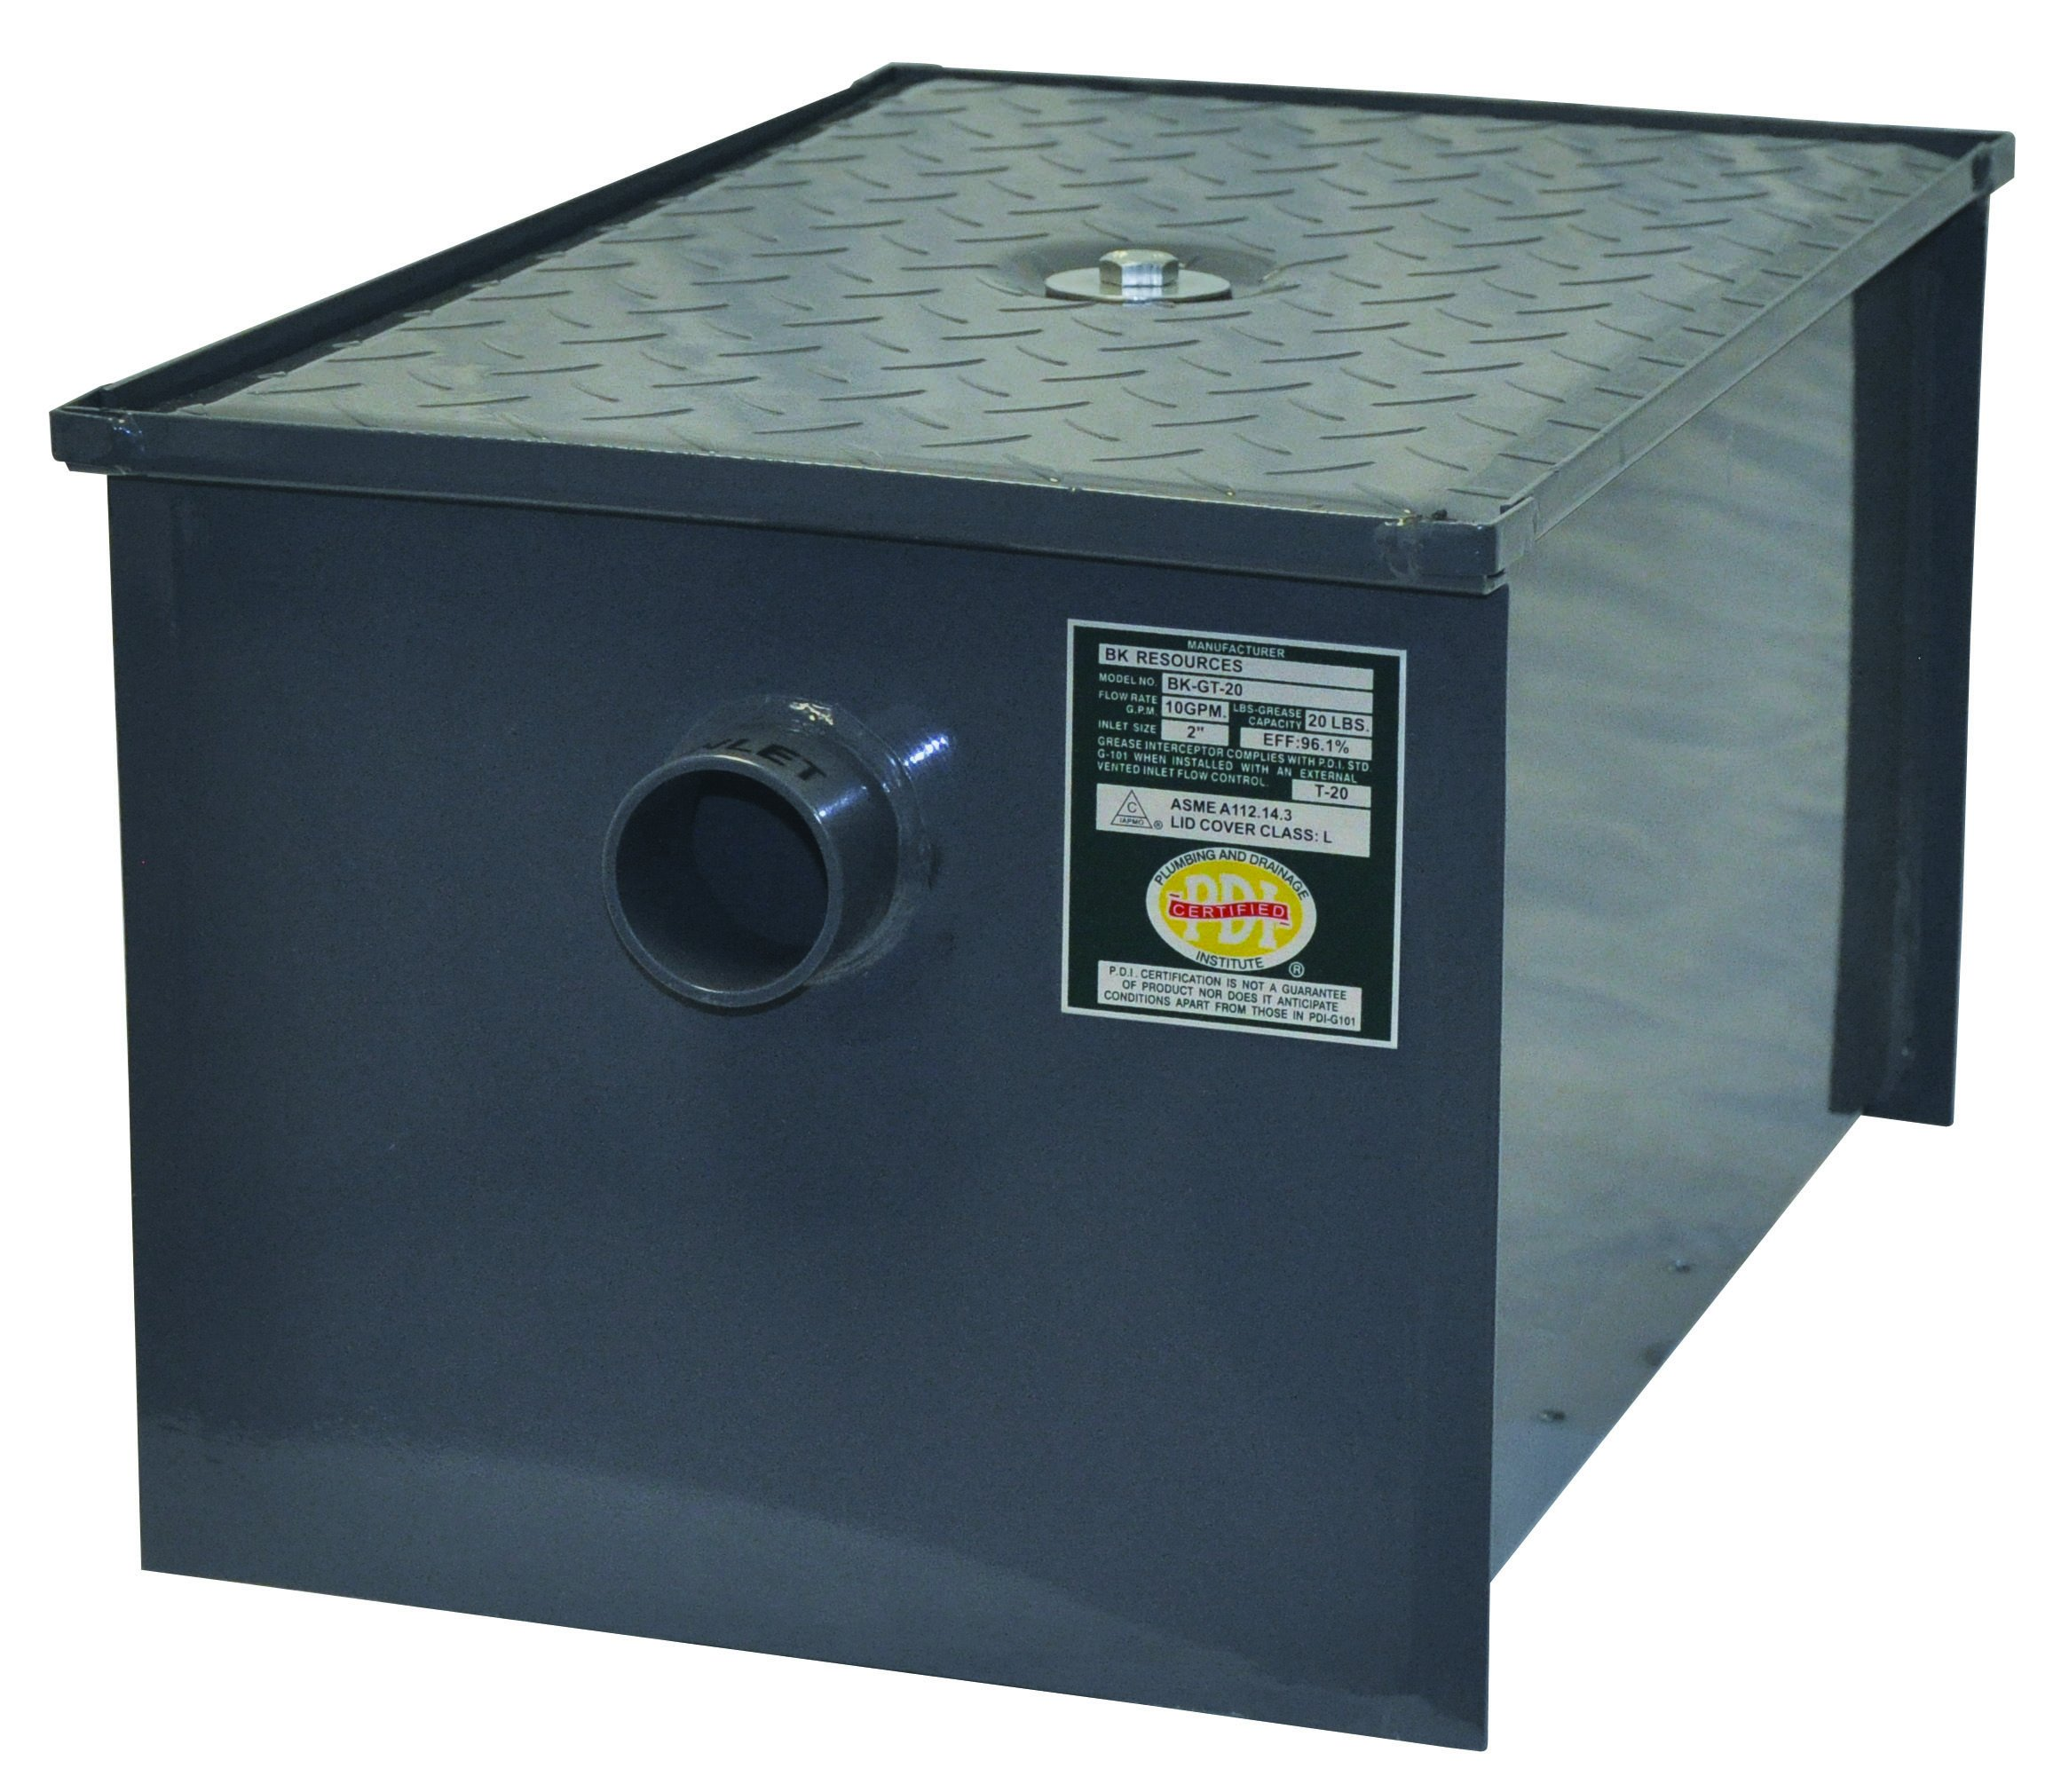 BK Resources 70 lb Grease Trap Interceptor